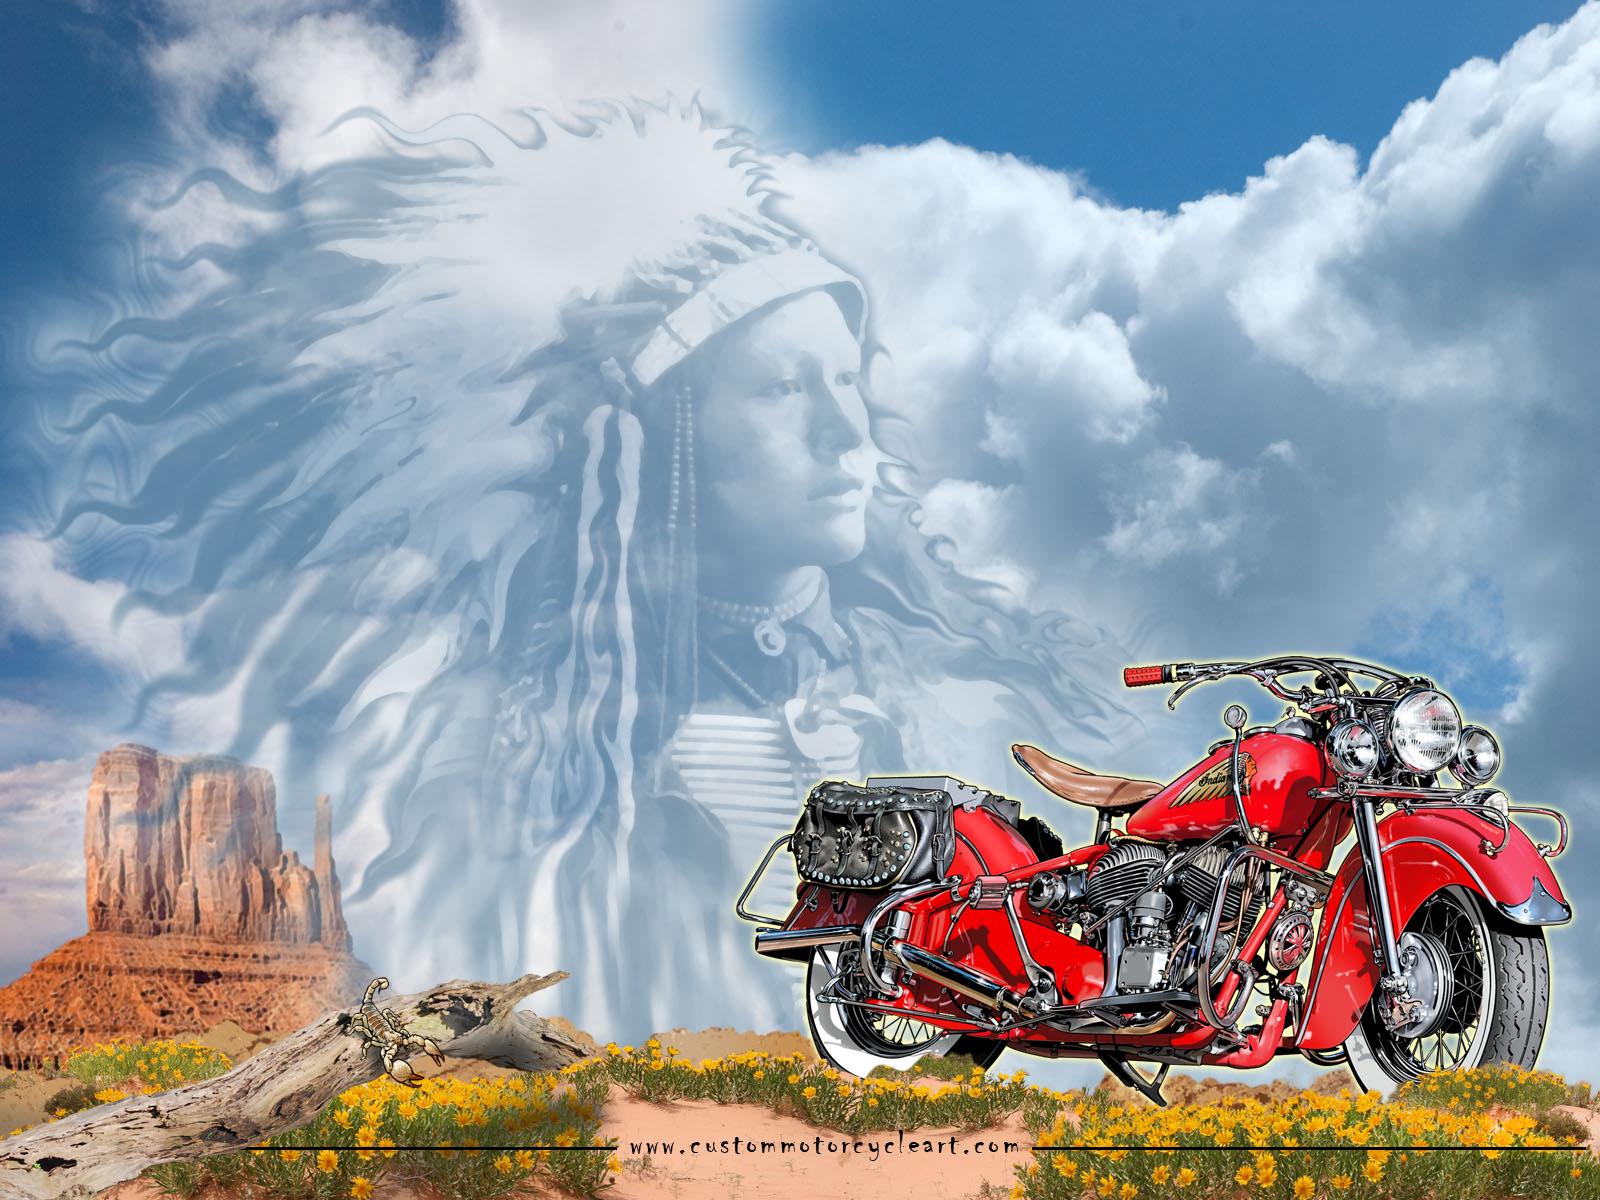 Motorcycle art wallpaper wallpapersafari - Art wallpaper pictures ...